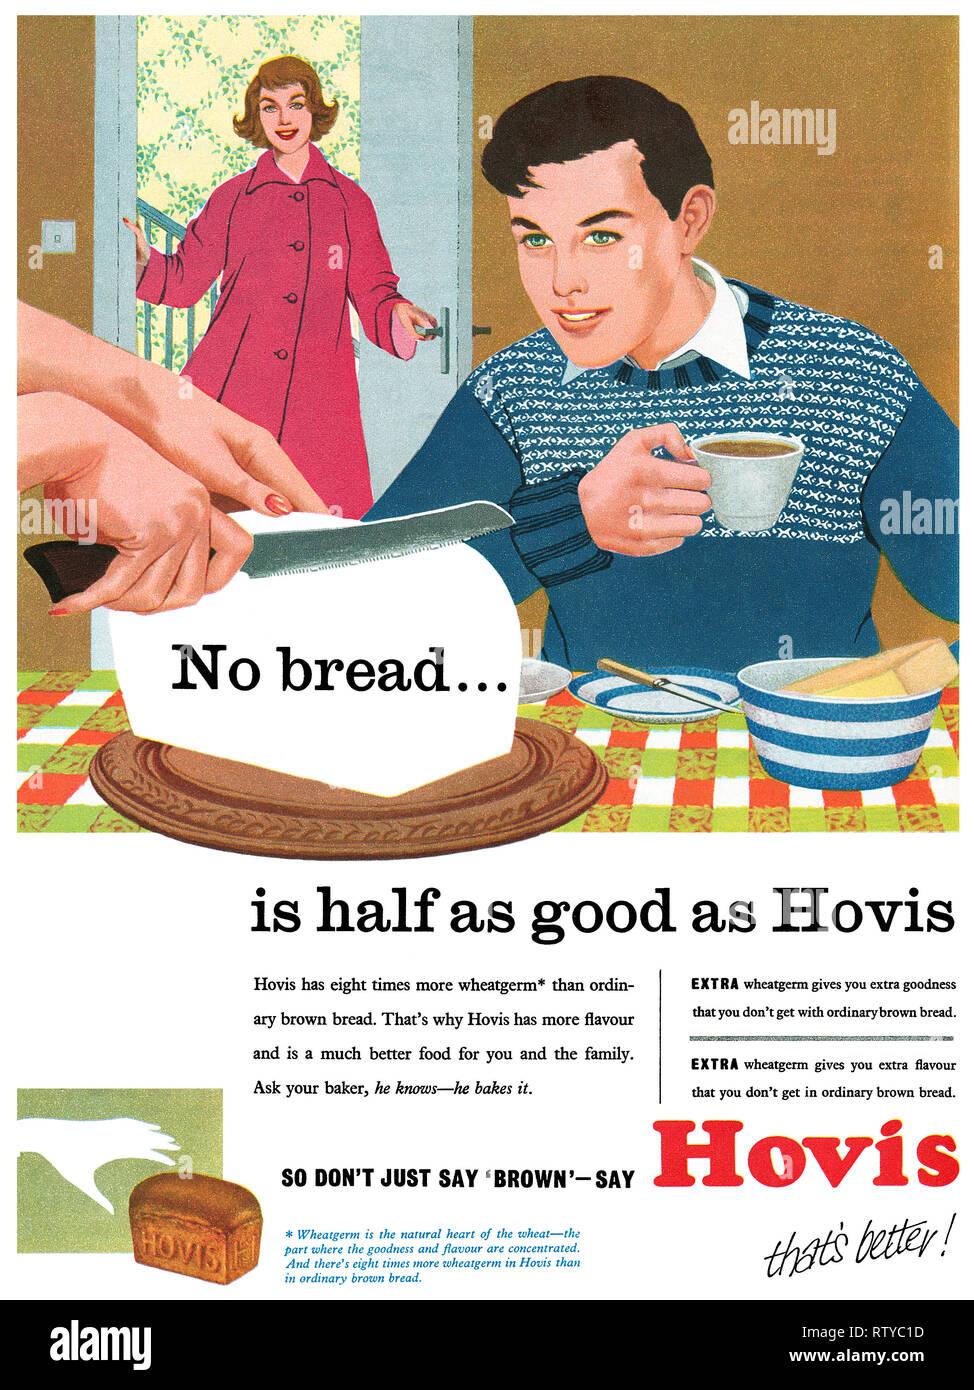 1958 British advertisement for Hovis bread. - Stock Image